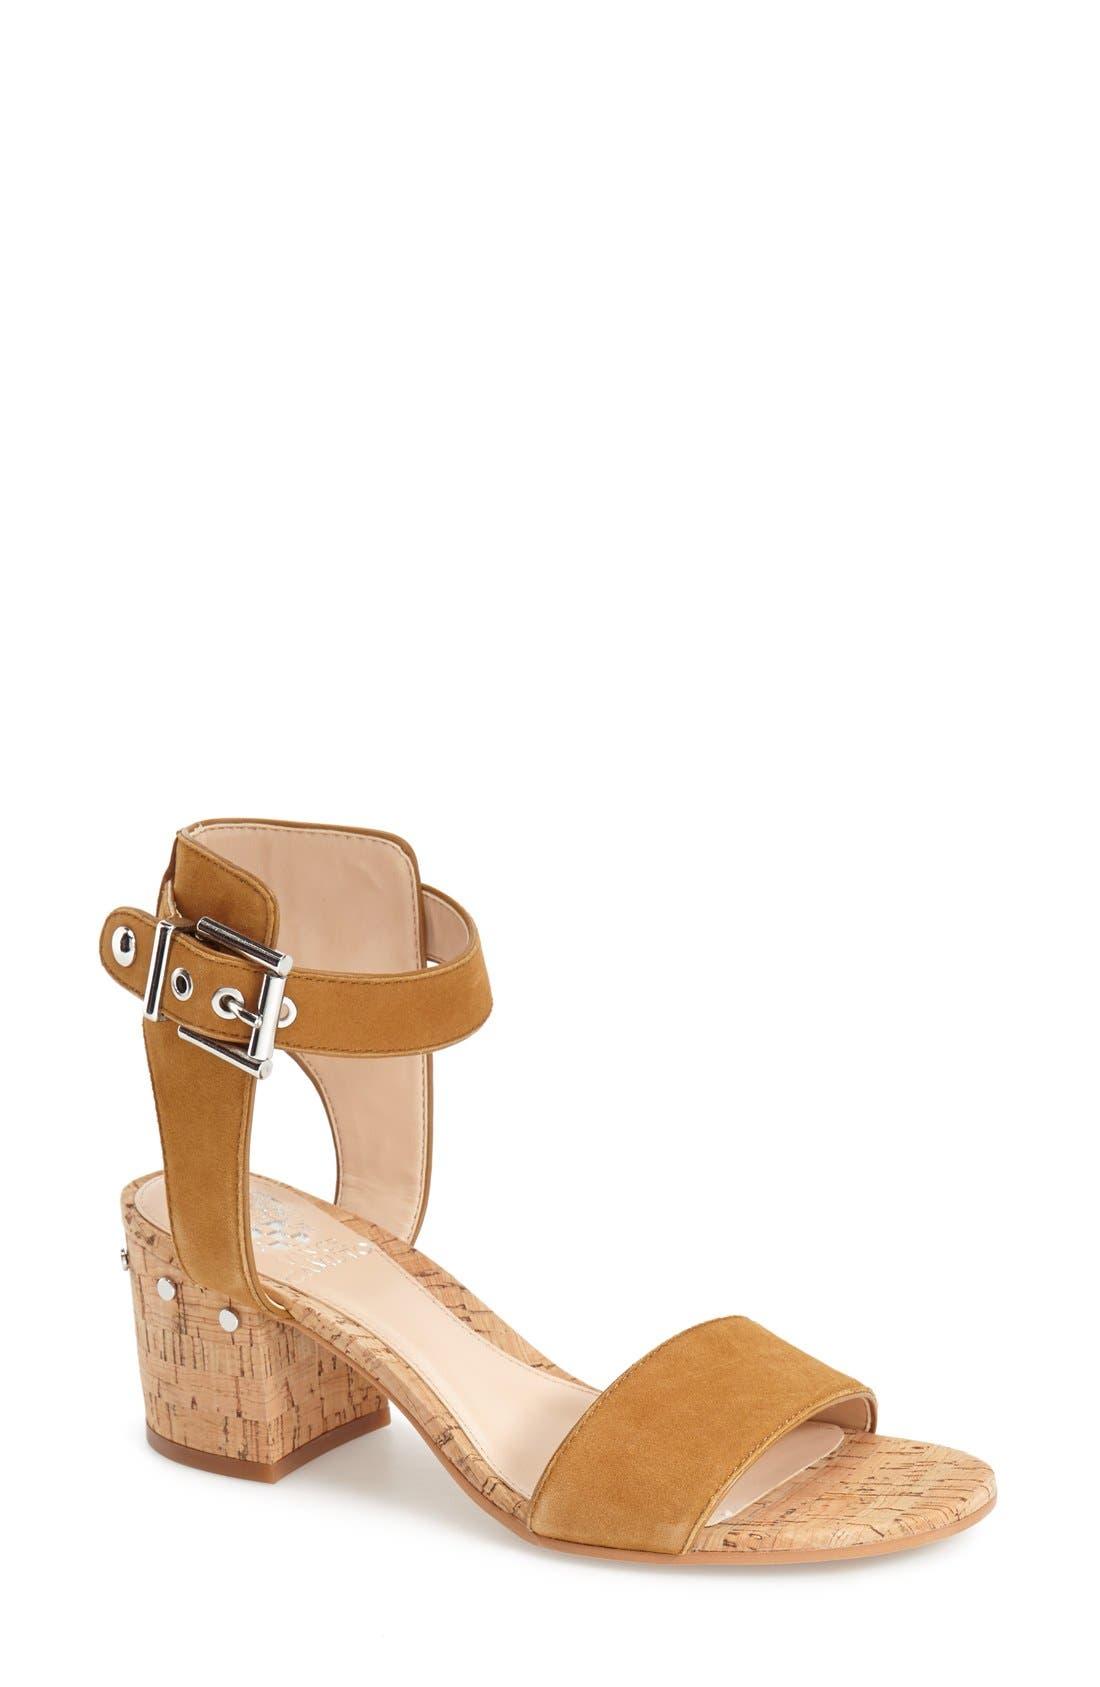 Alternate Image 1 Selected - Vince Camuto 'Baeden' Sandal (Women)